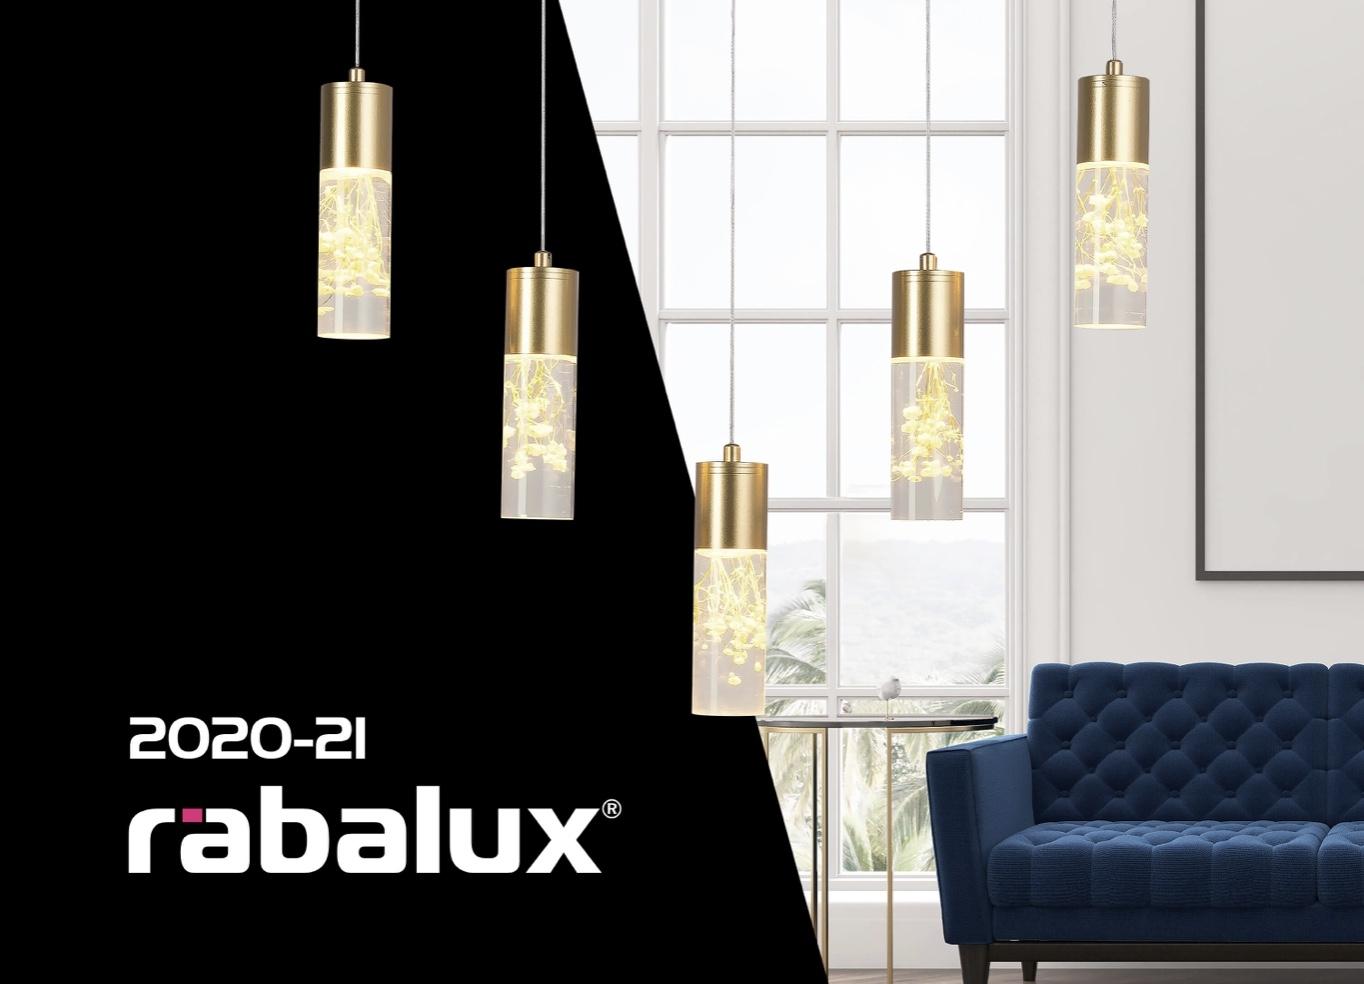 RABALUX product catalogue 2020/21